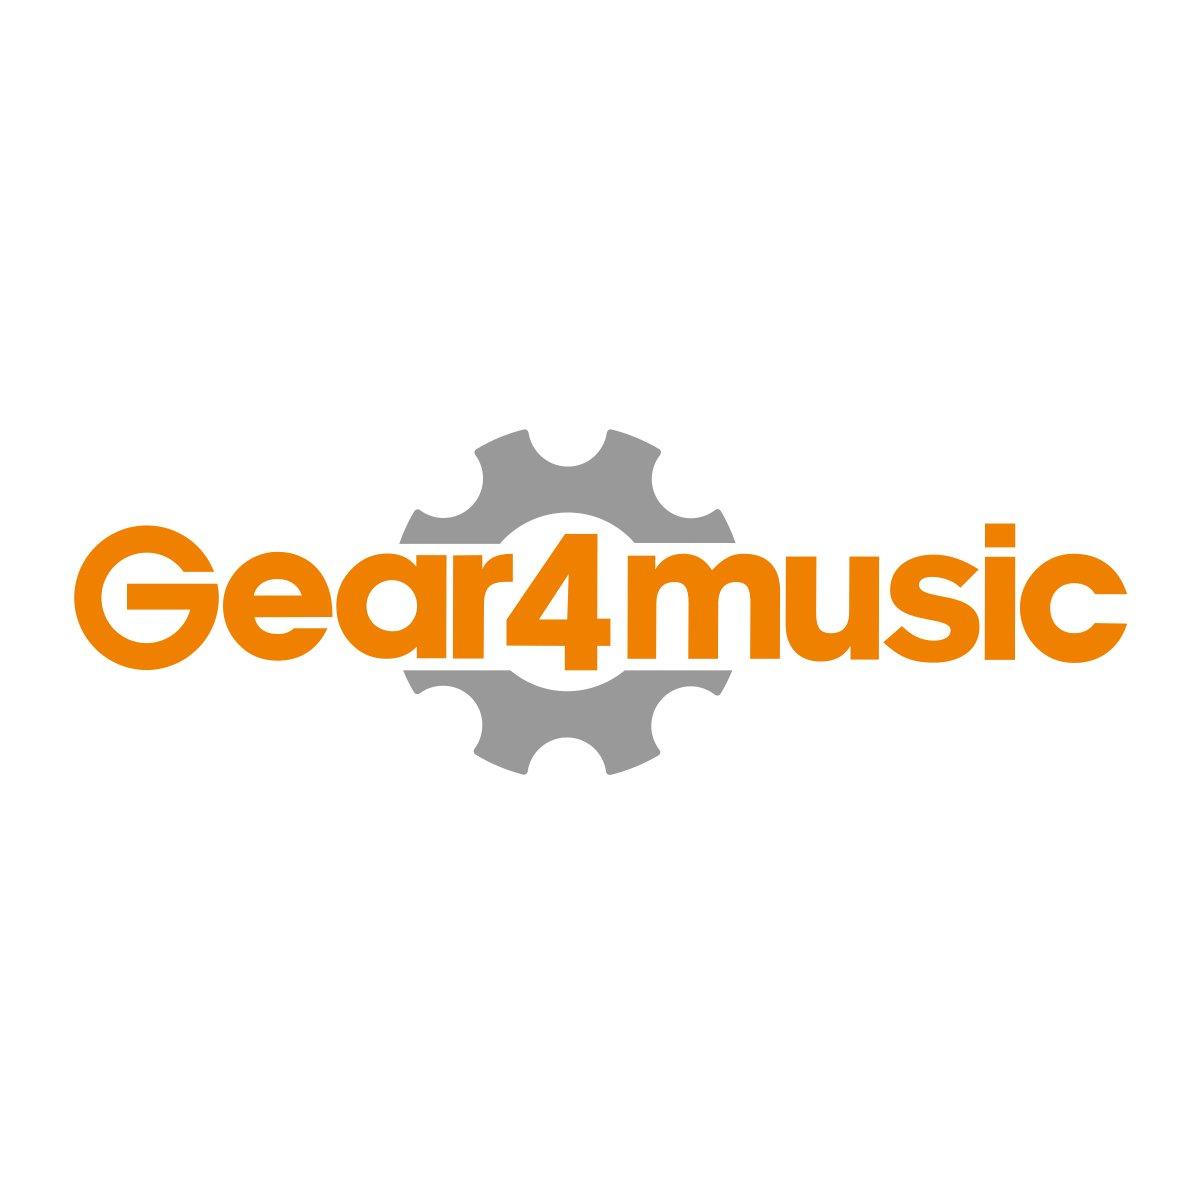 batterie ahead tabourets gear4music. Black Bedroom Furniture Sets. Home Design Ideas